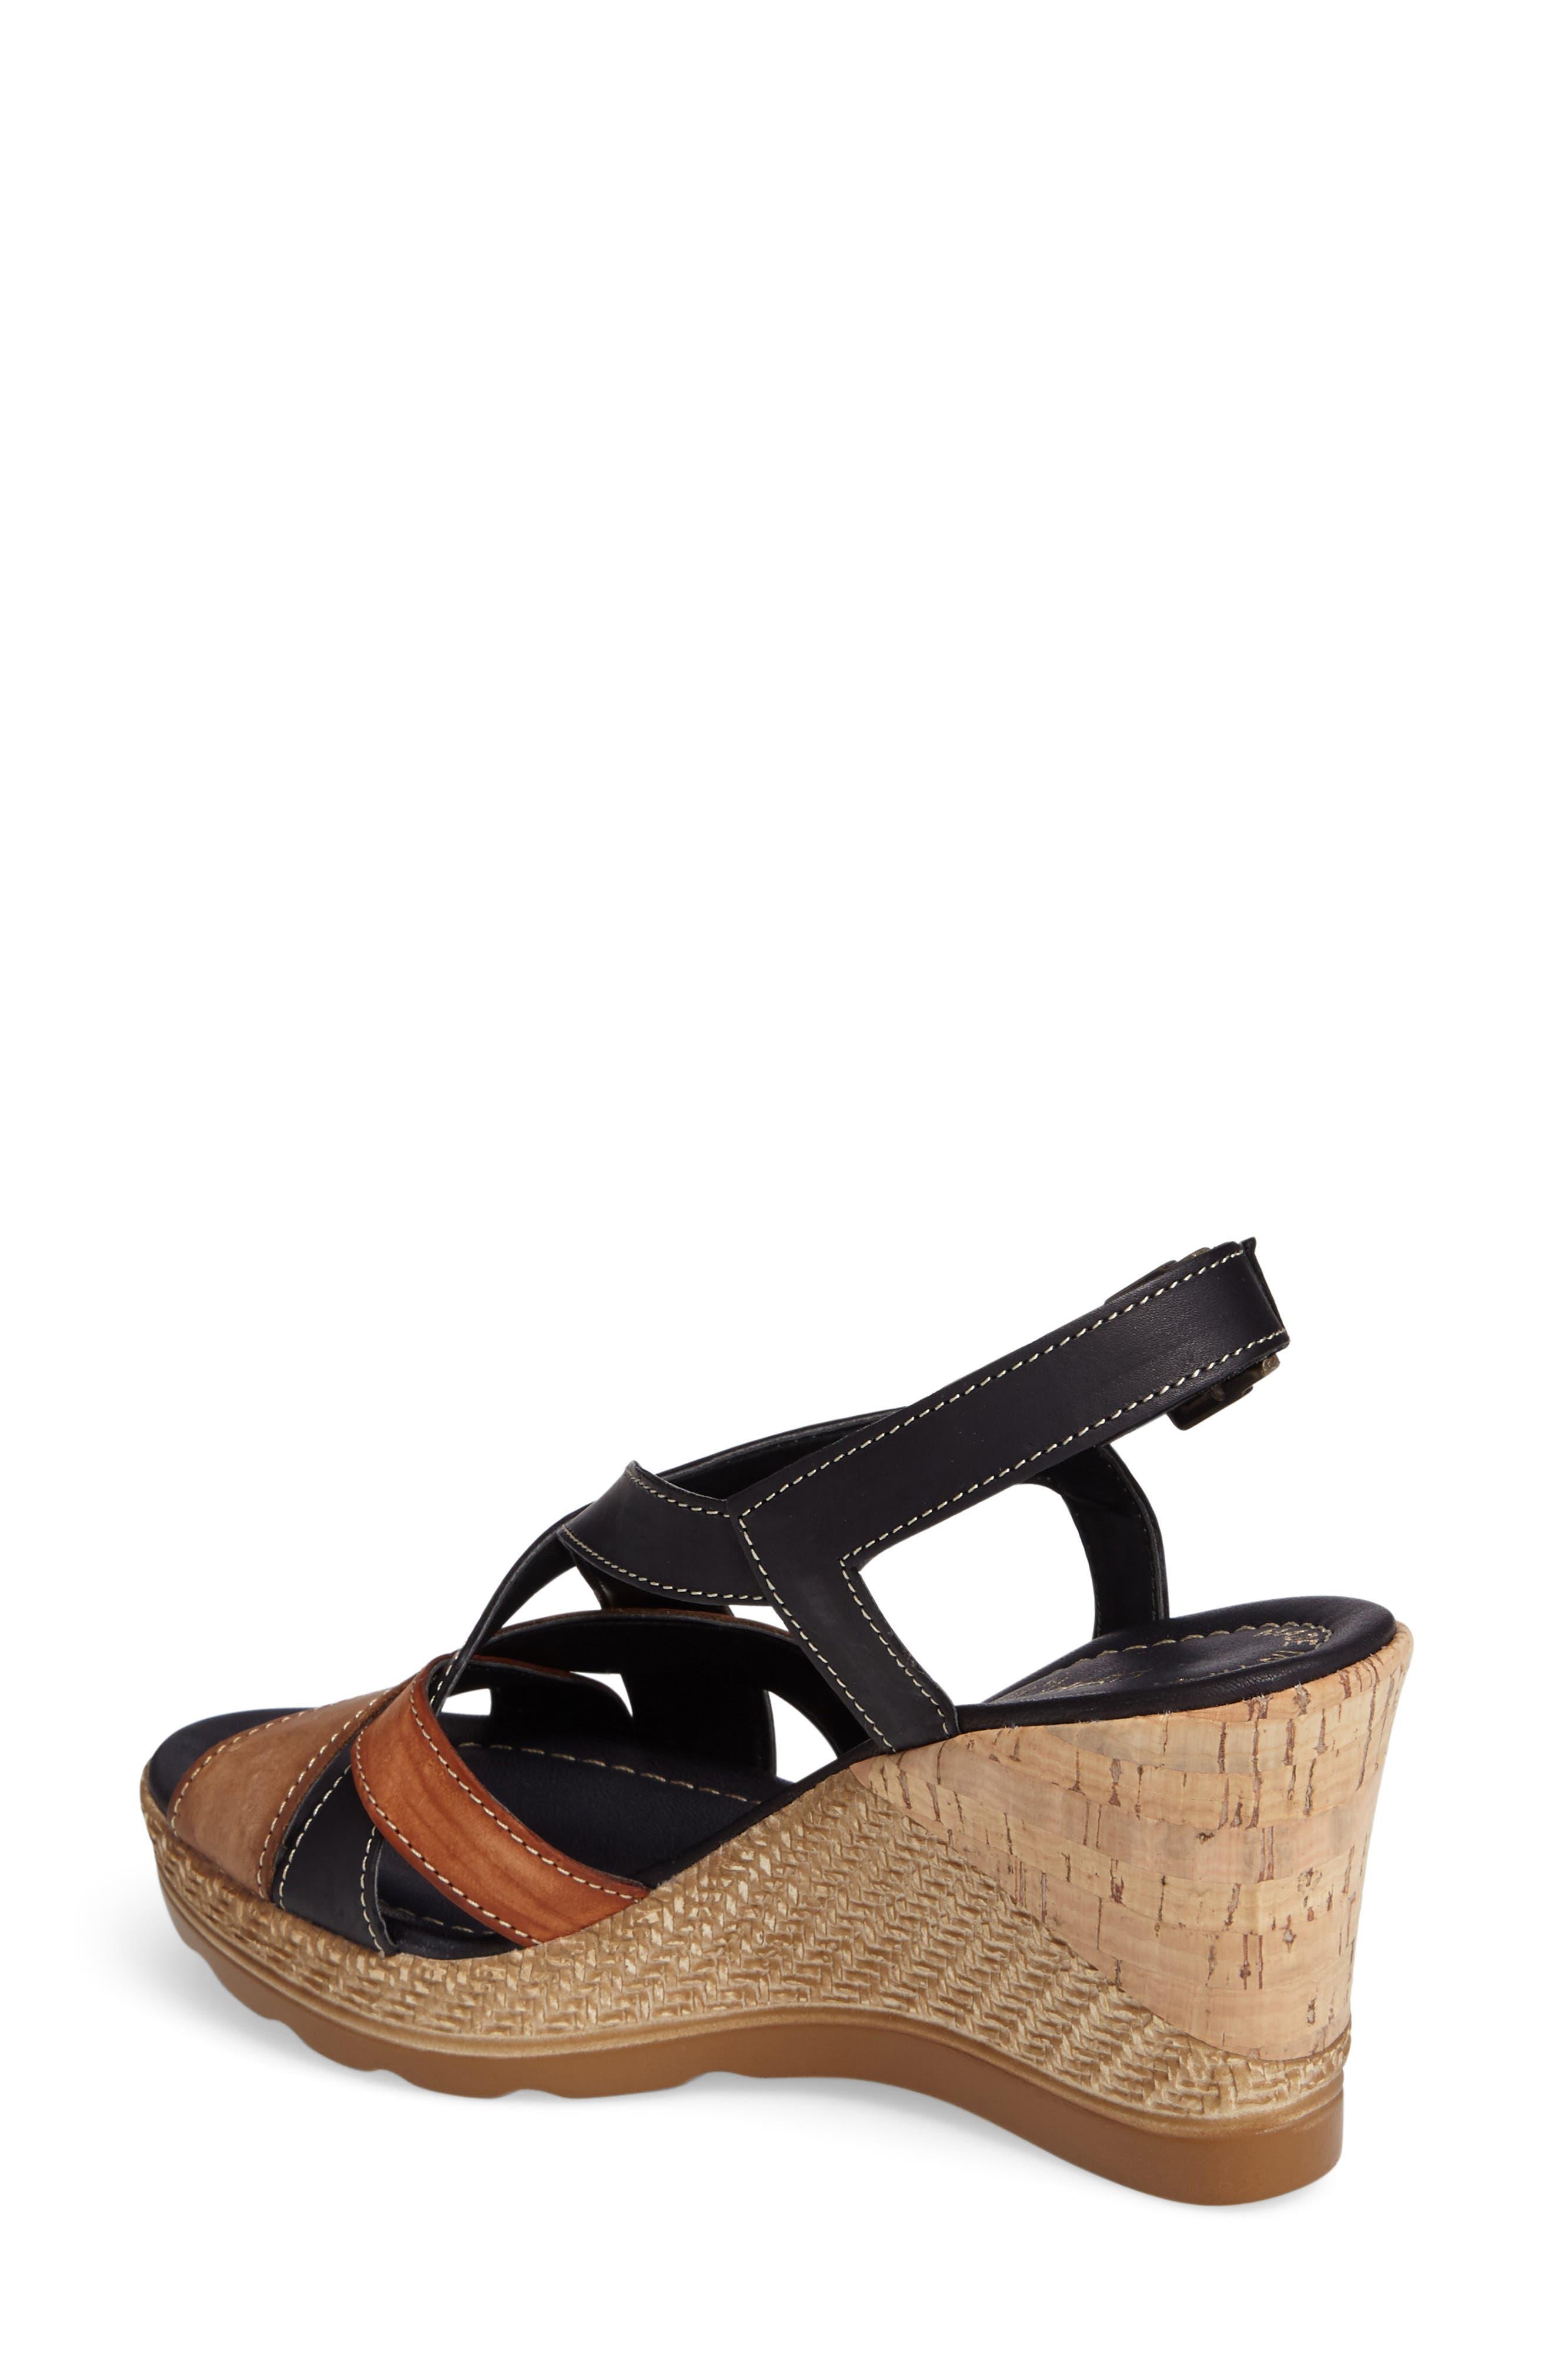 Modena Wedge Sandal,                             Alternate thumbnail 2, color,                             001